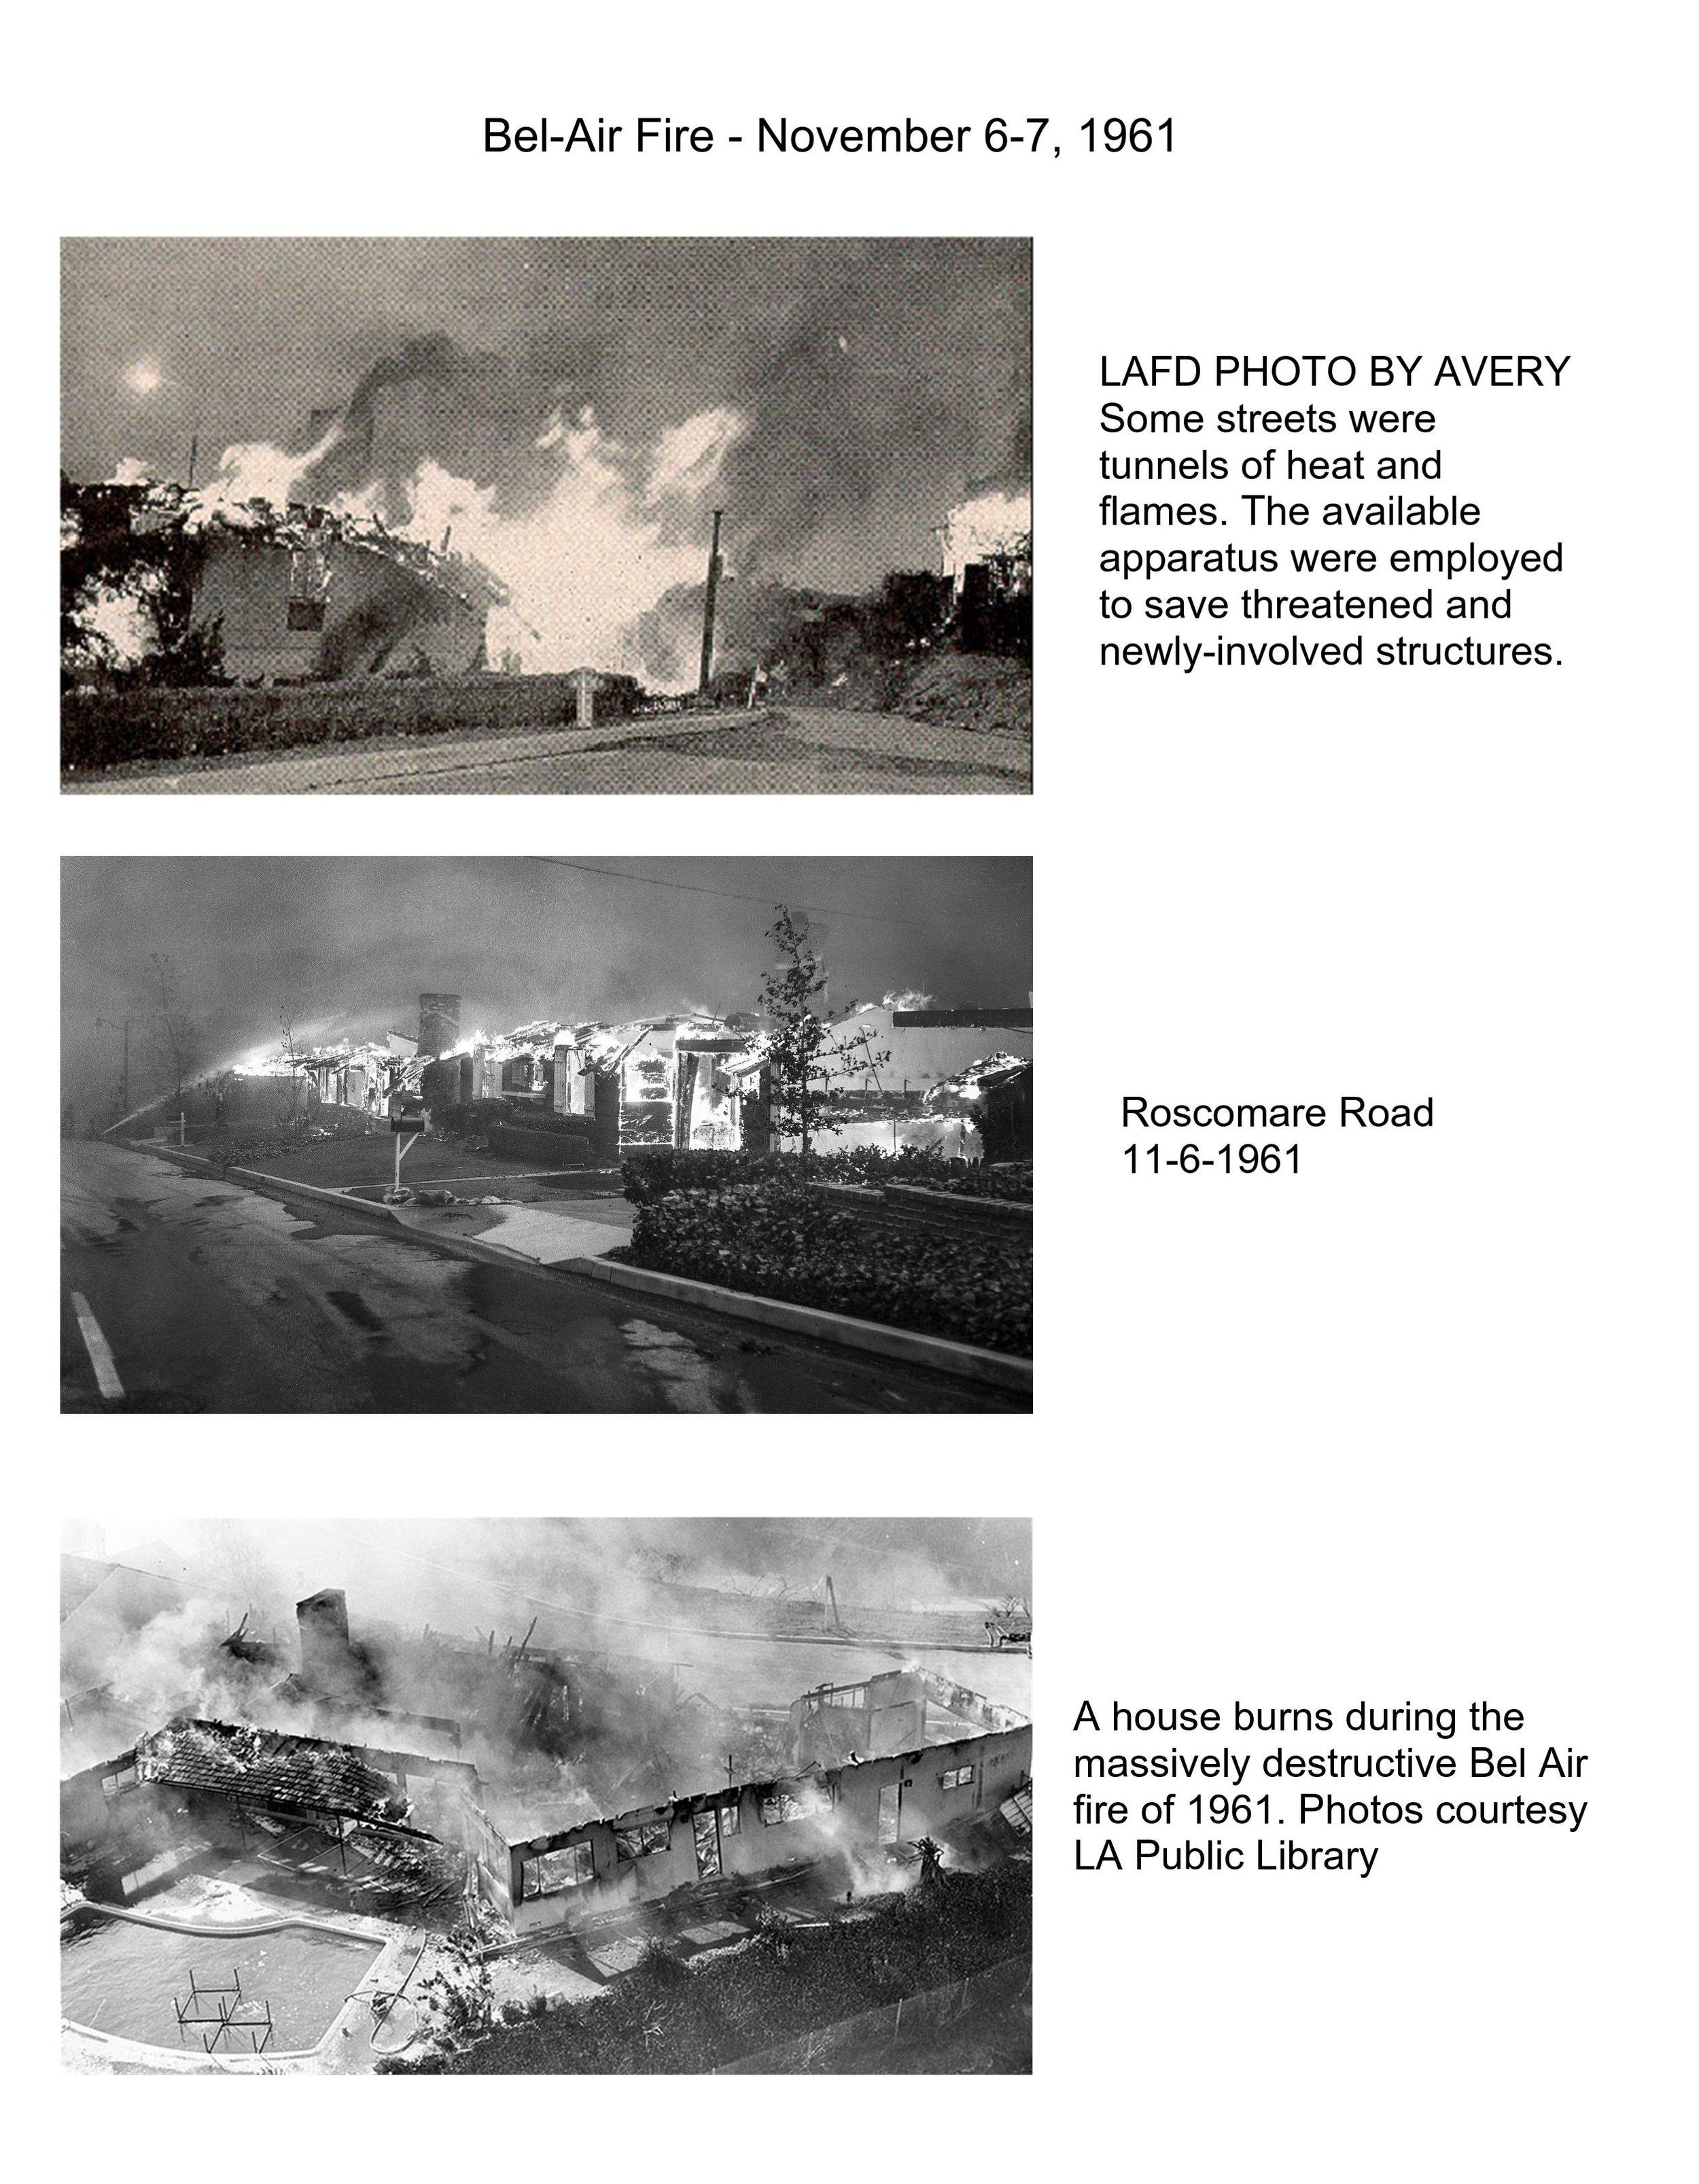 Bel Air Fire NOV 6-7 1961 1.jpg